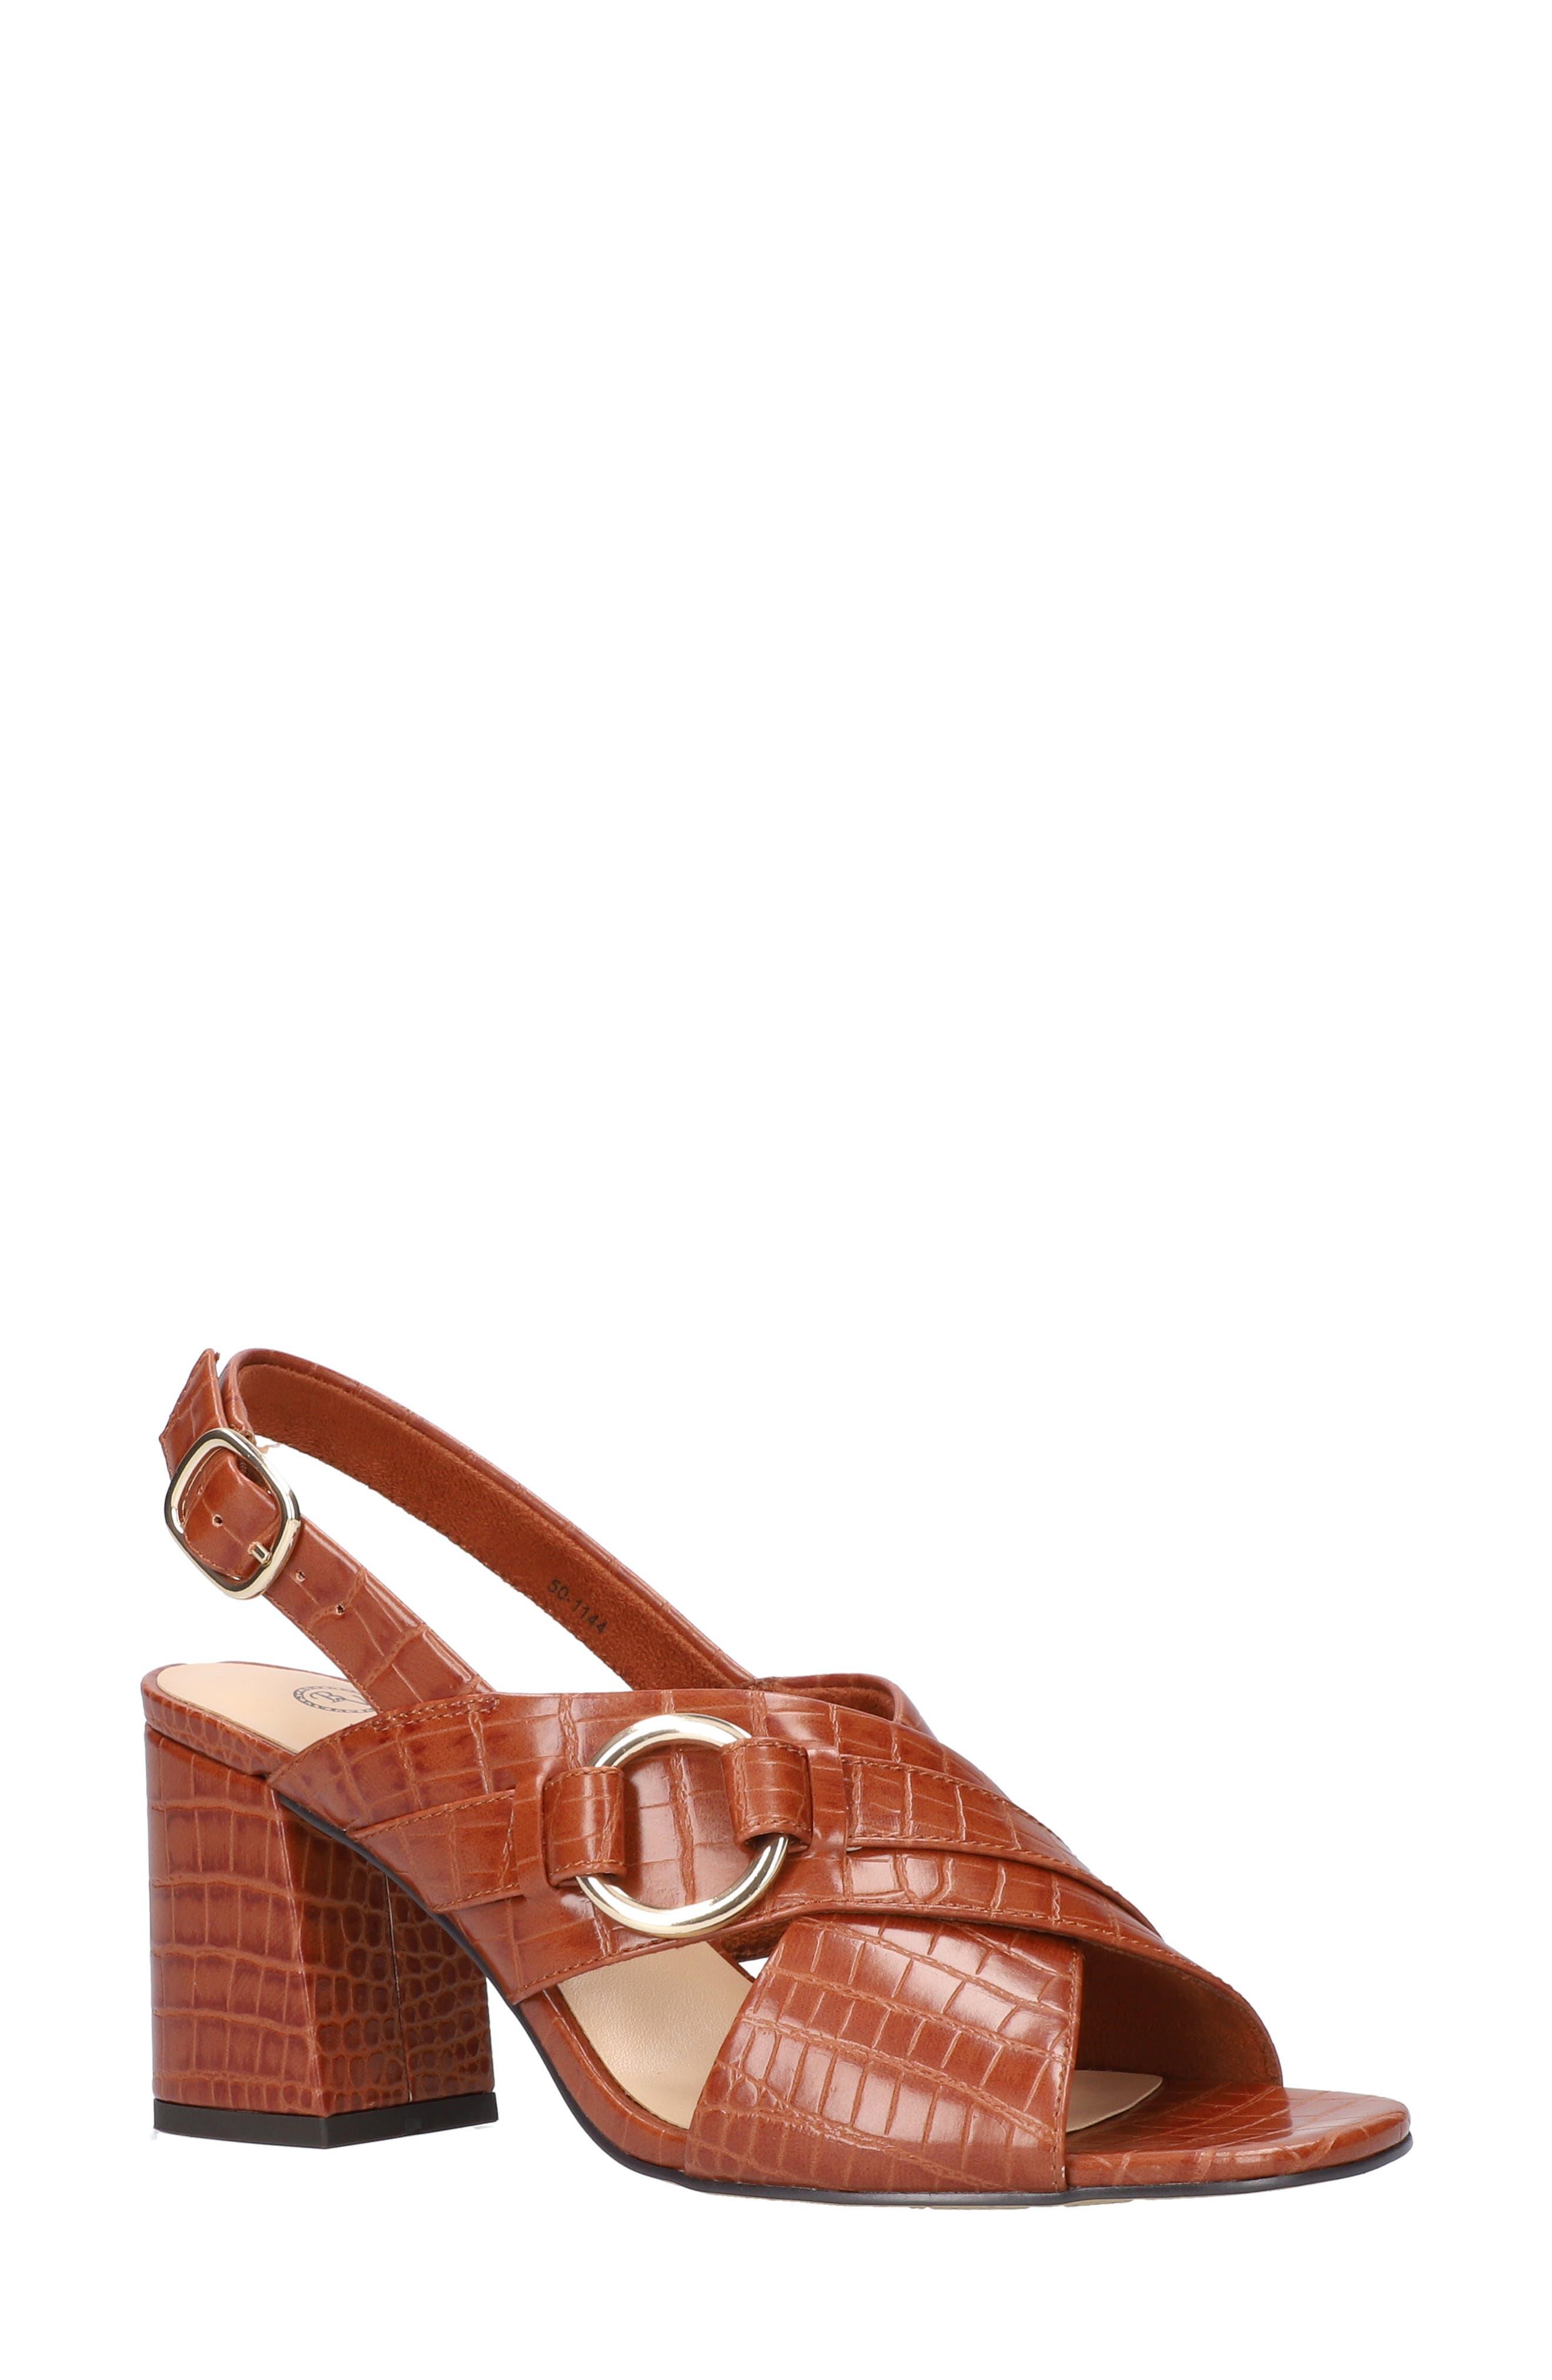 Bexley Slingback Sandal